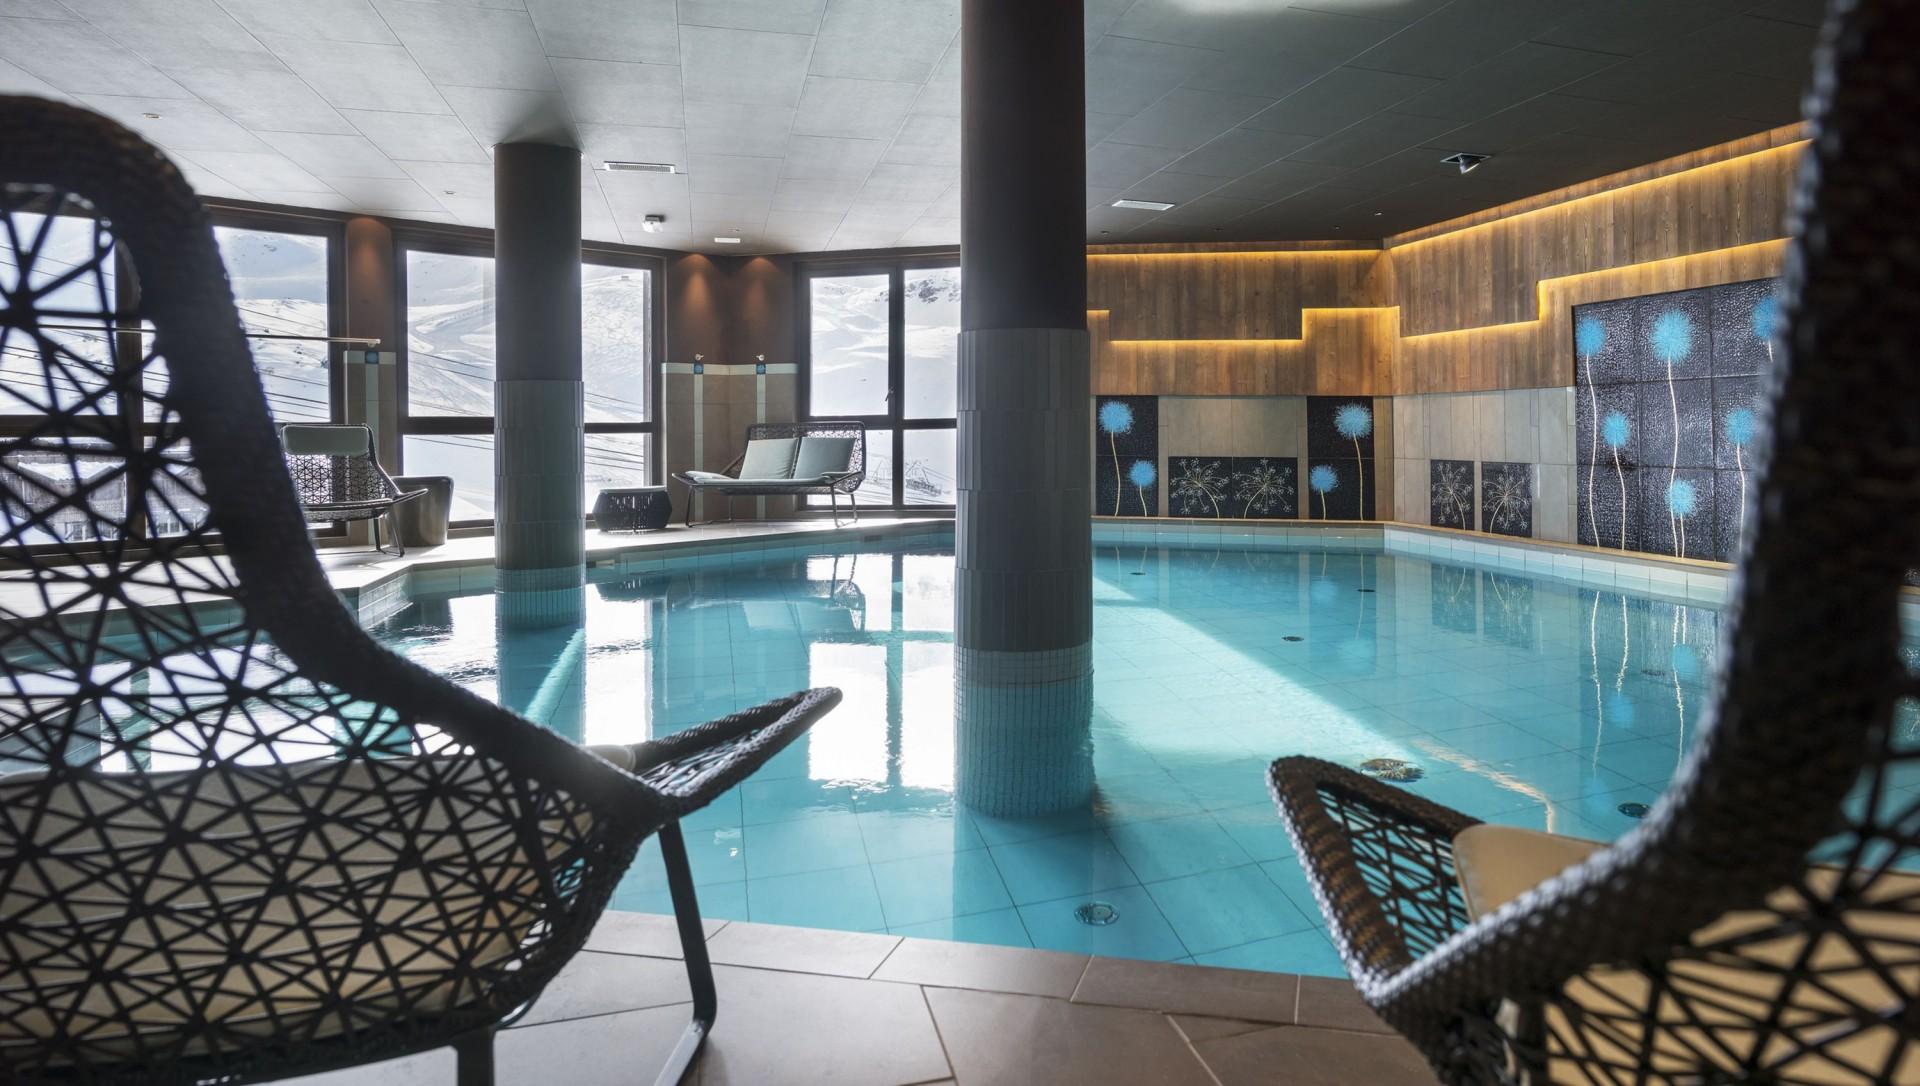 Val Thorens Location Appartement Luxe Valykite Piscine